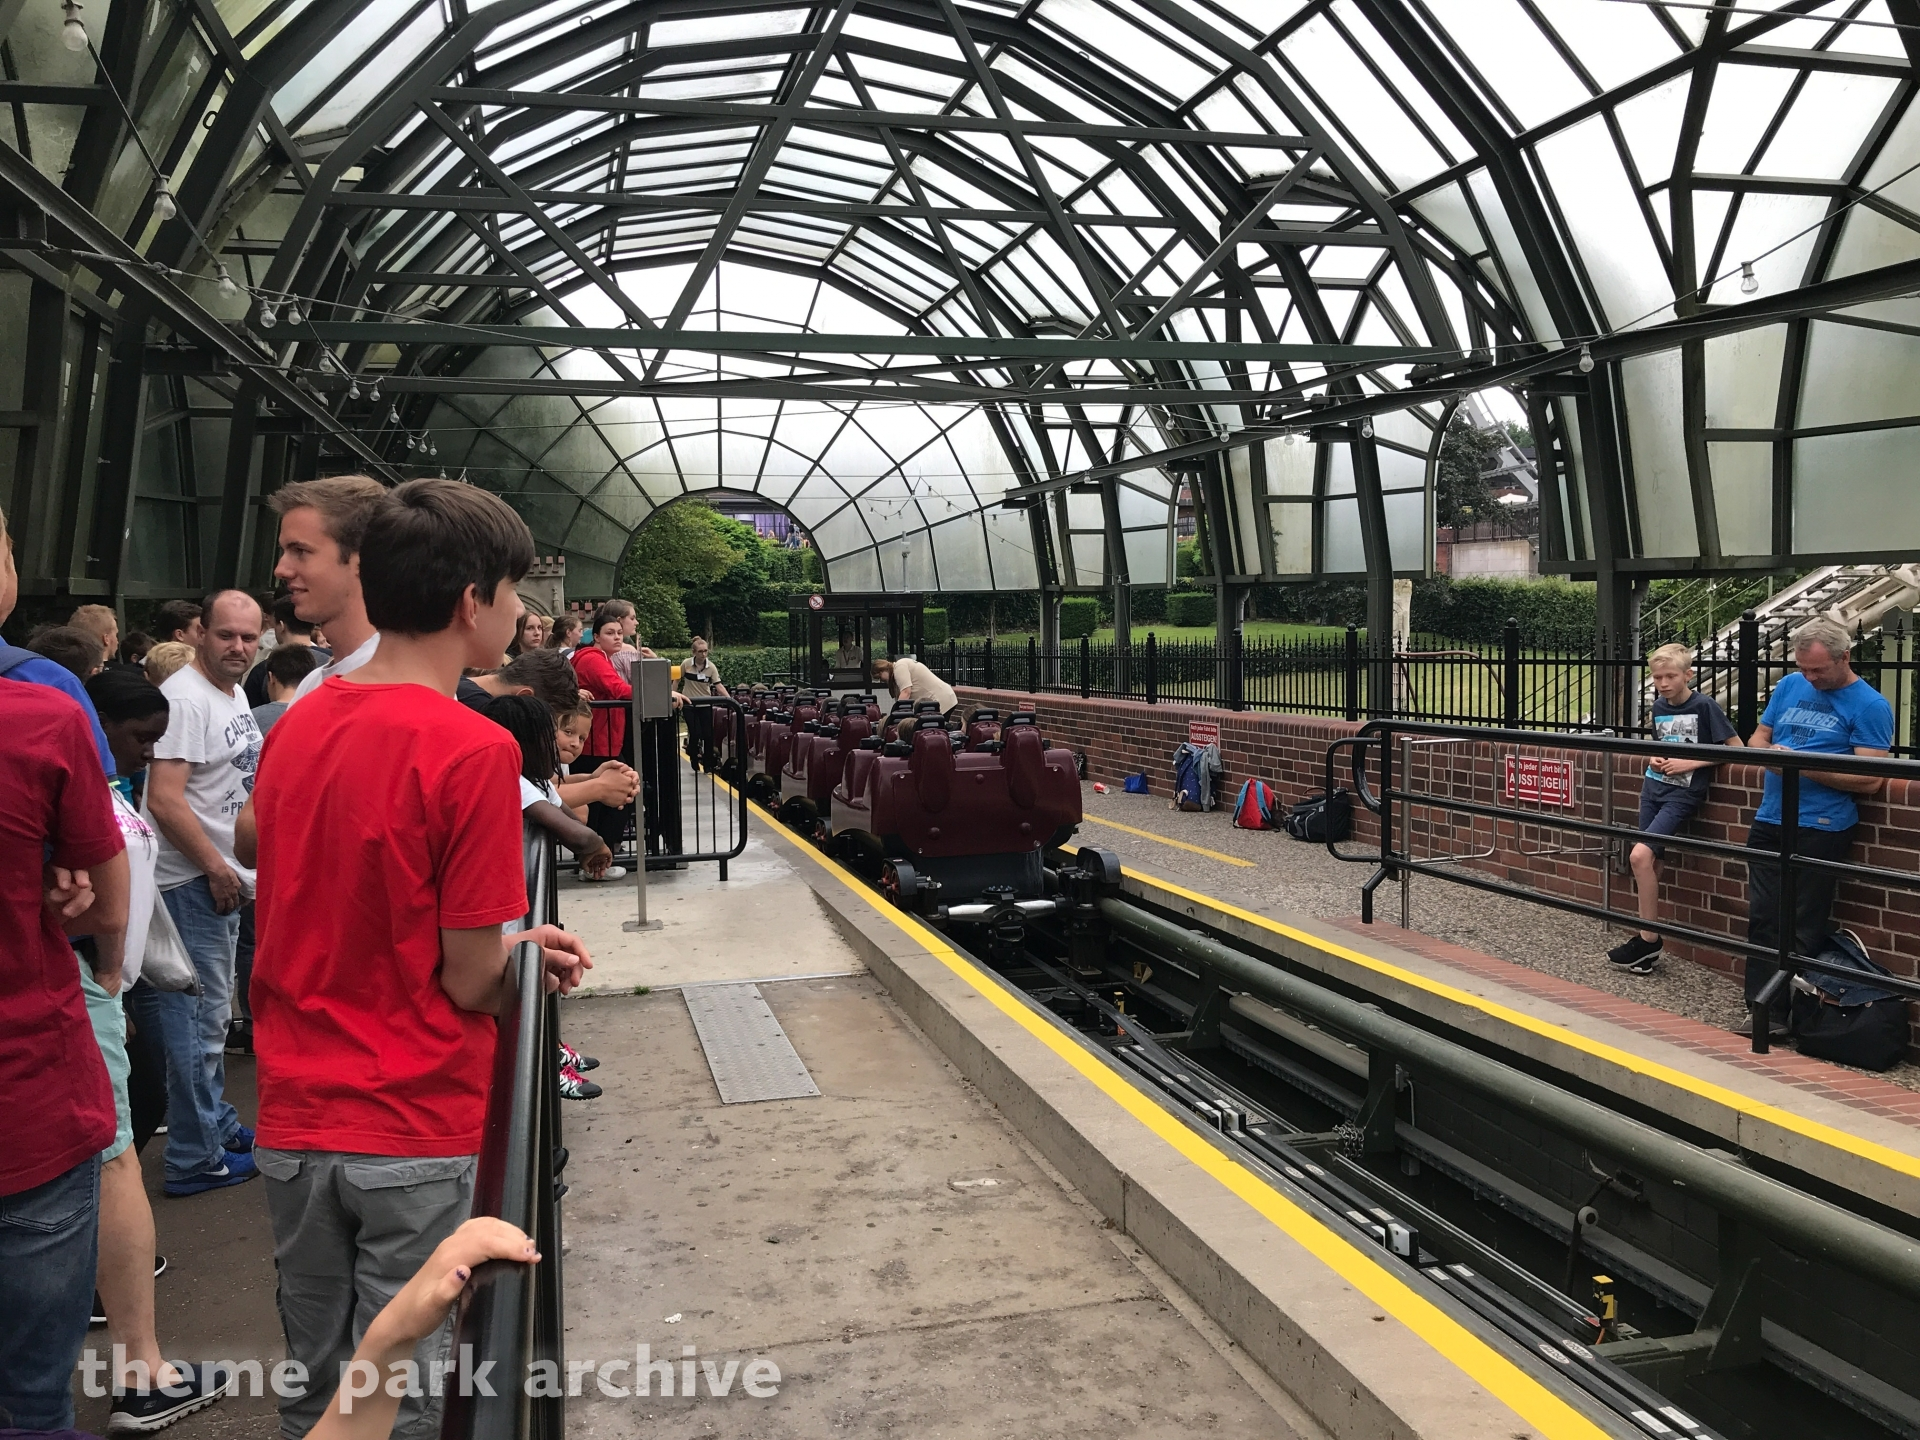 Big Loop At Heide Park Theme Park Archive